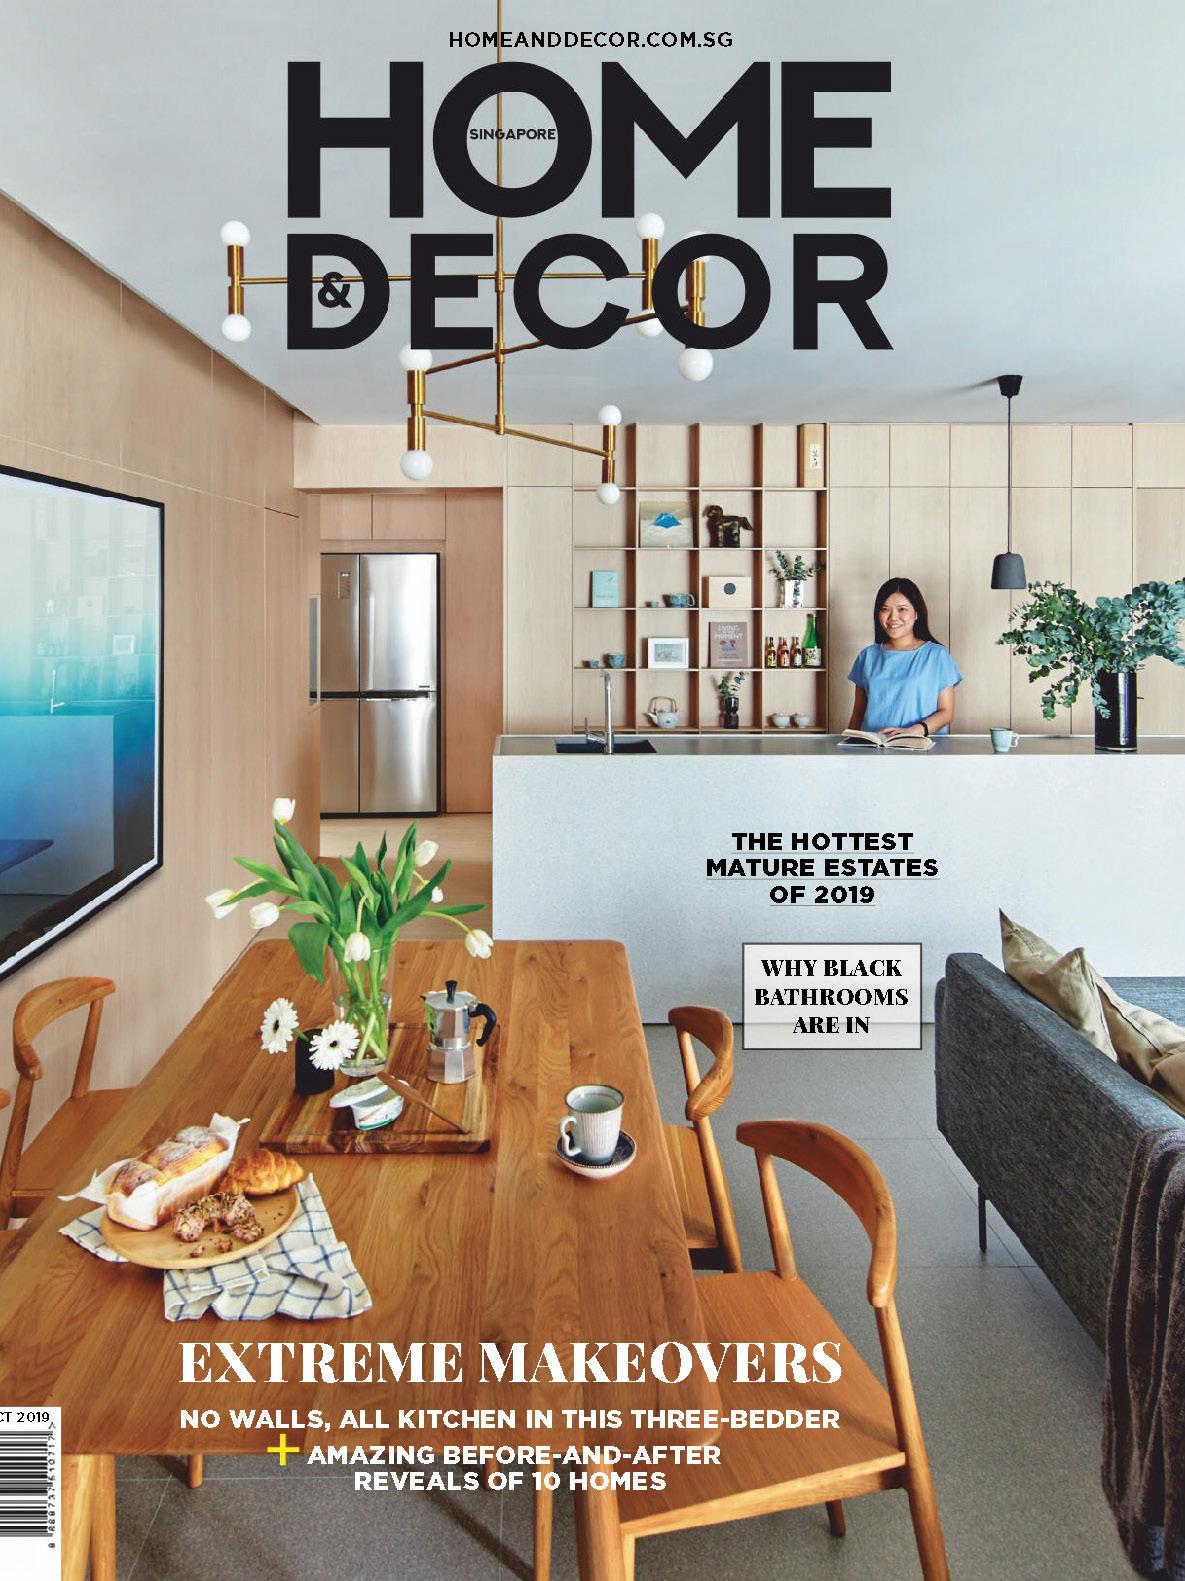 《Home & Decor》新加坡室内设计流行趋势杂志2019年10月号